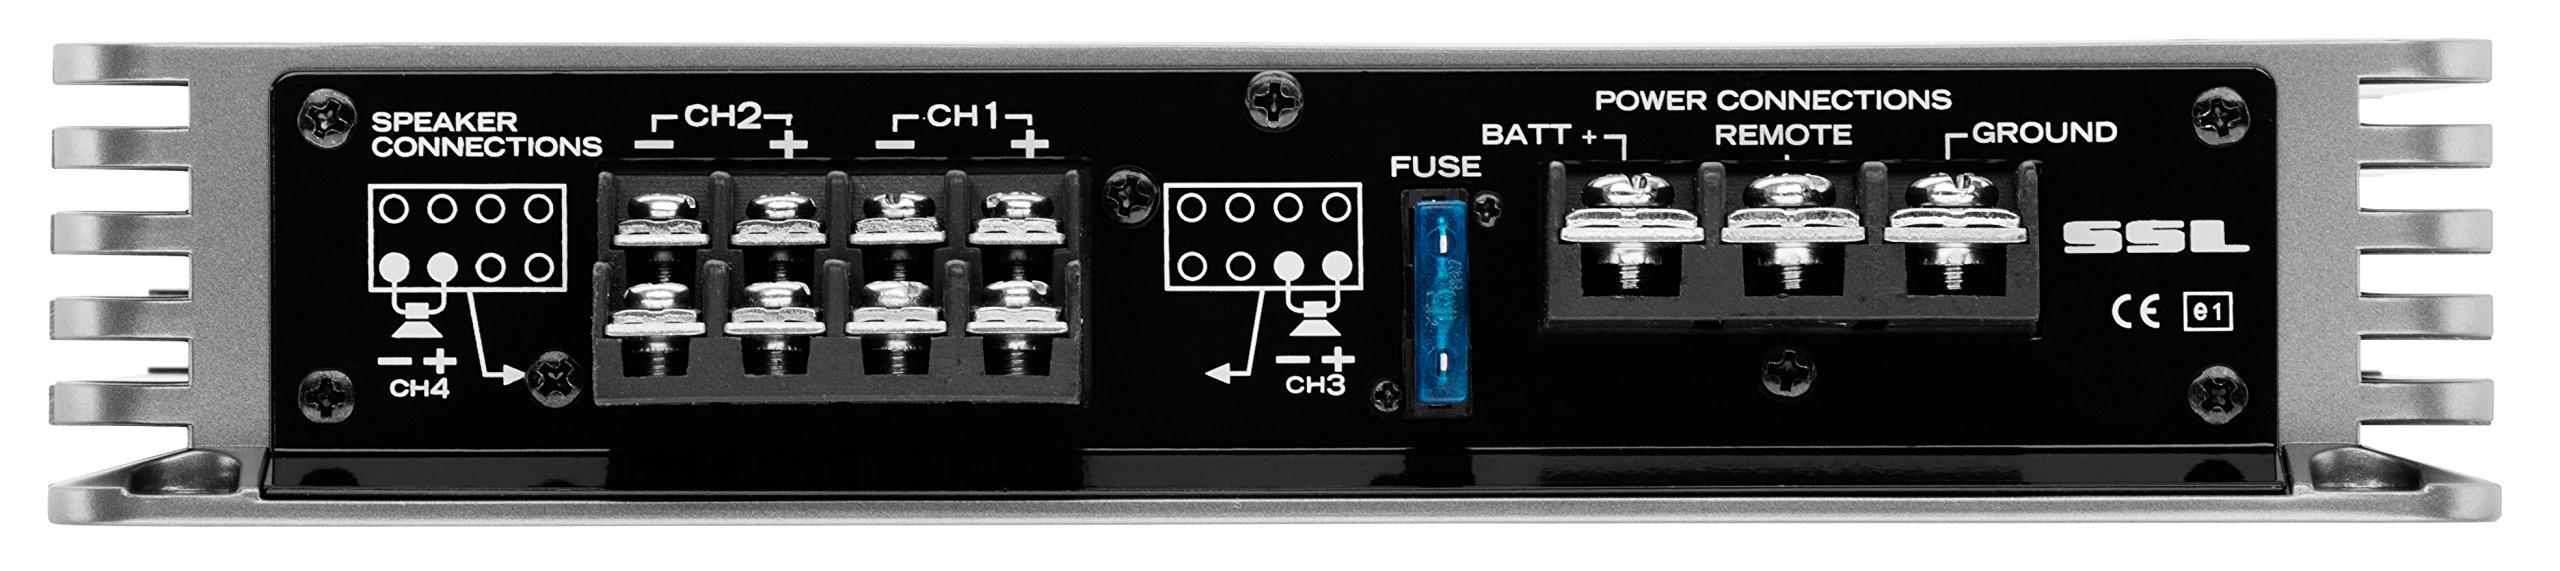 Sound Storm EV4.400 Evolution 400 Watt, 4 Channel, 2 to 8 Ohm Stable Class A/B, Full Range Car Amplifier by Sound Storm Laboratories (Image #2)